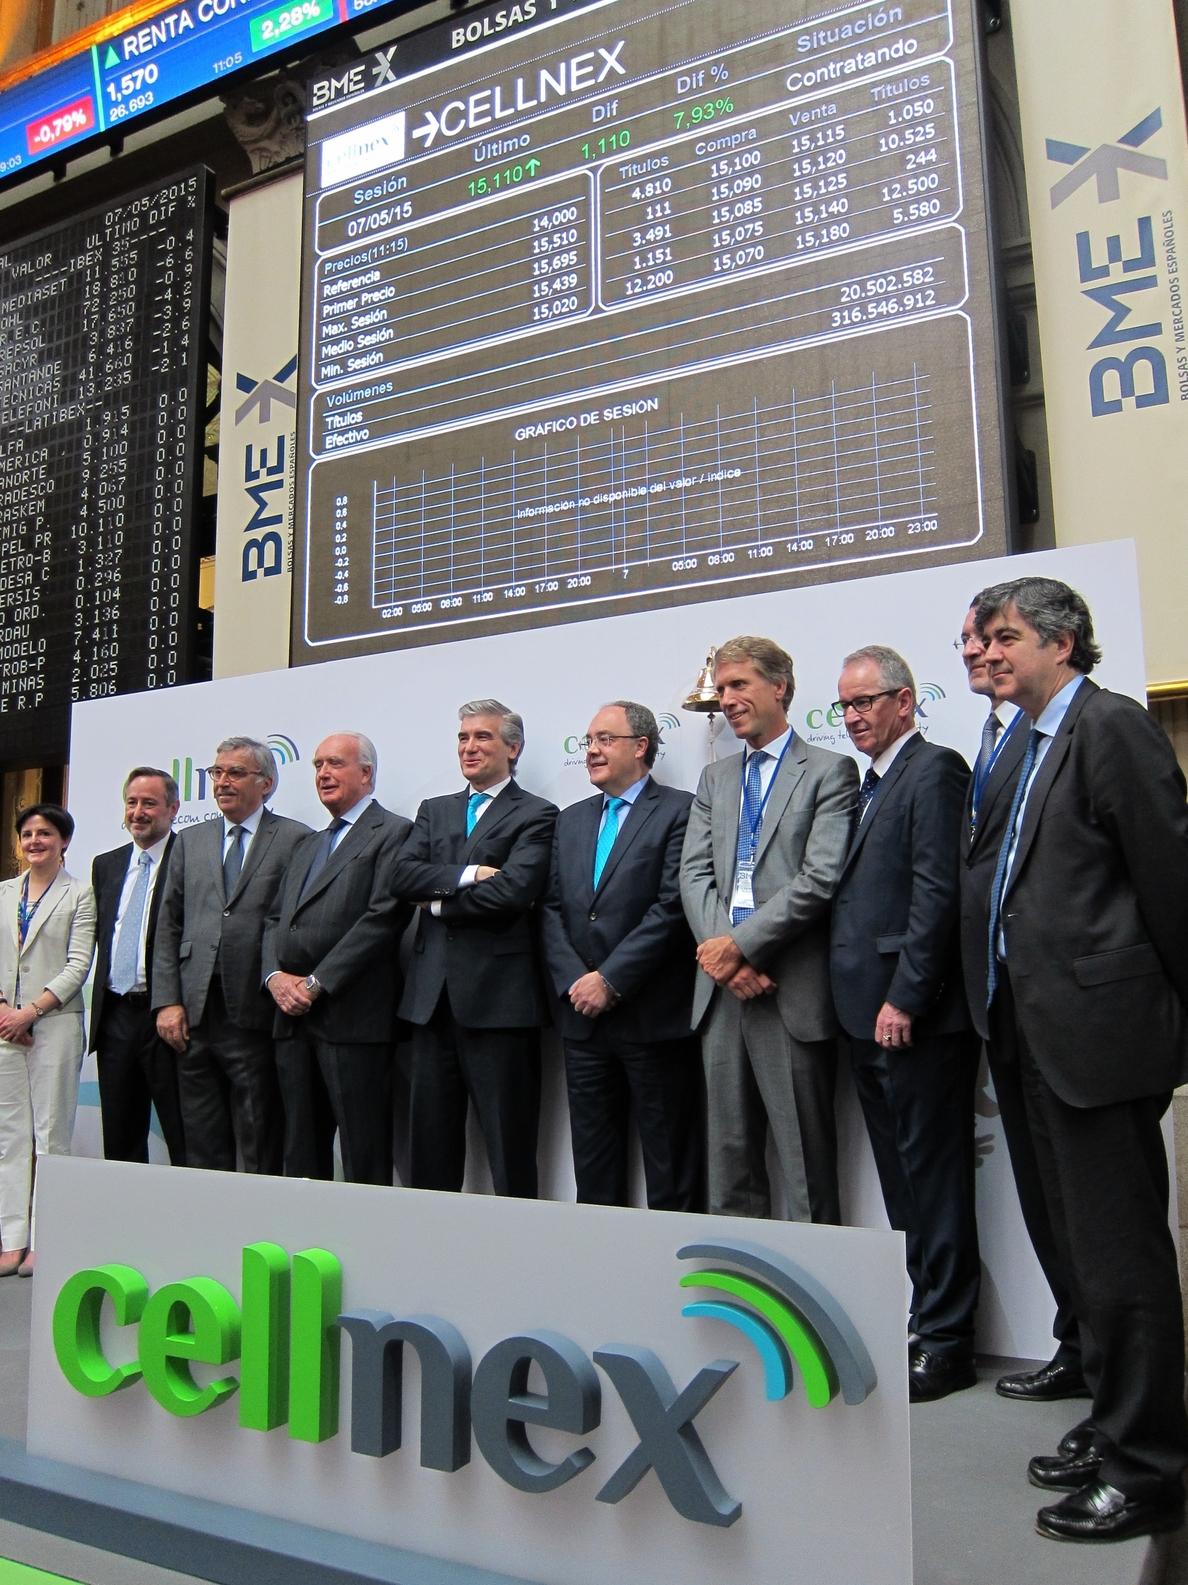 Abertis ingresa 2.140 millones con la salida a Bolsa de Cellnex